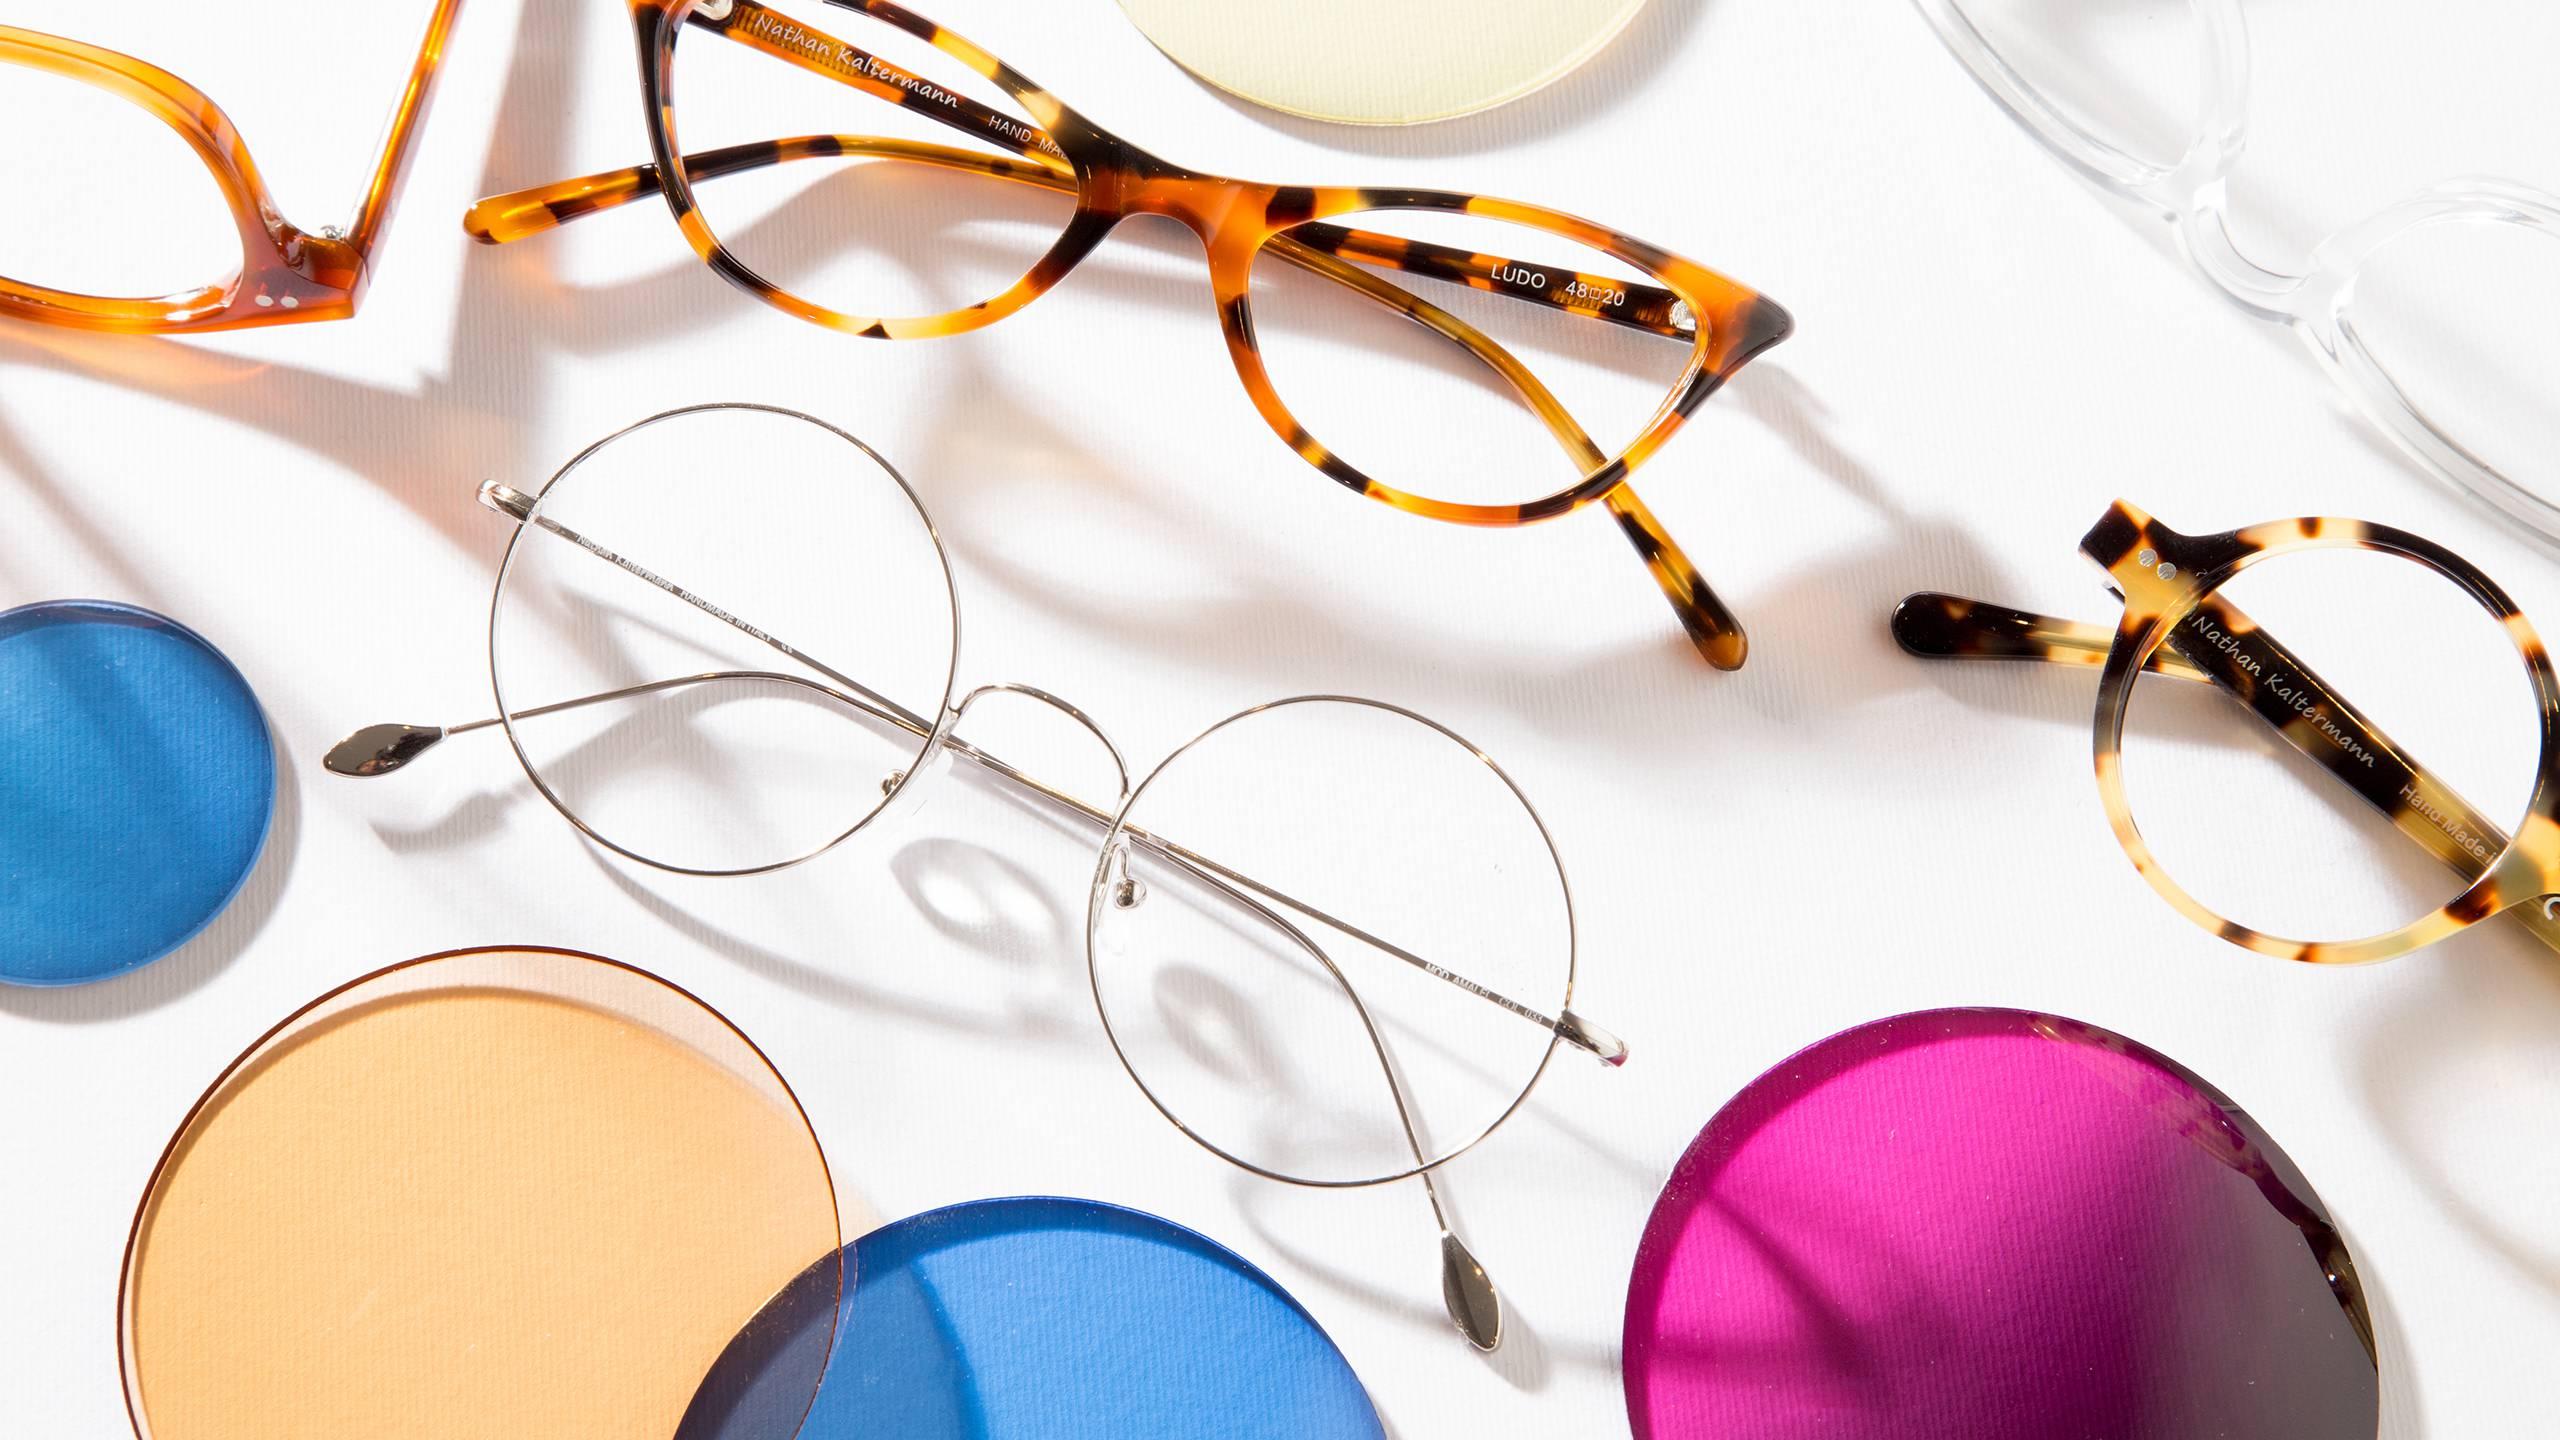 eyeglasses-Nathan-Kaltermann-made-in-Italy-IMG-6051